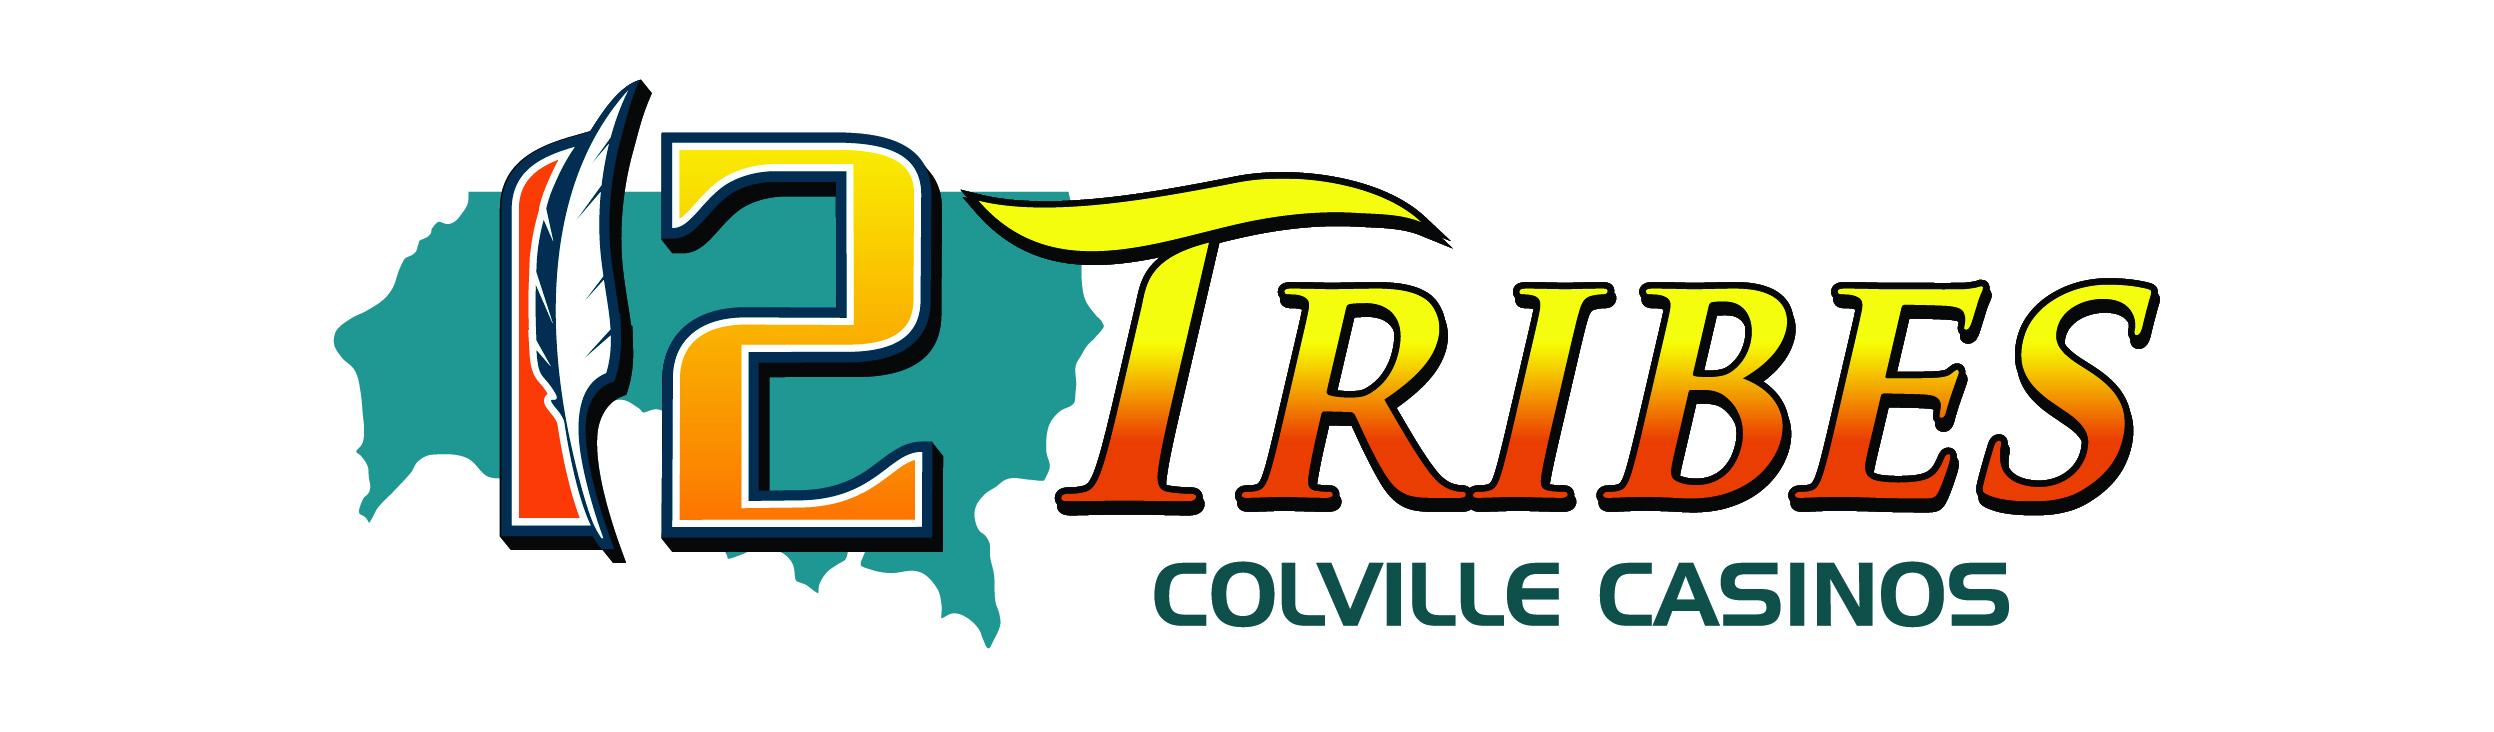 12 Tribes Colville Casinos Horizontal